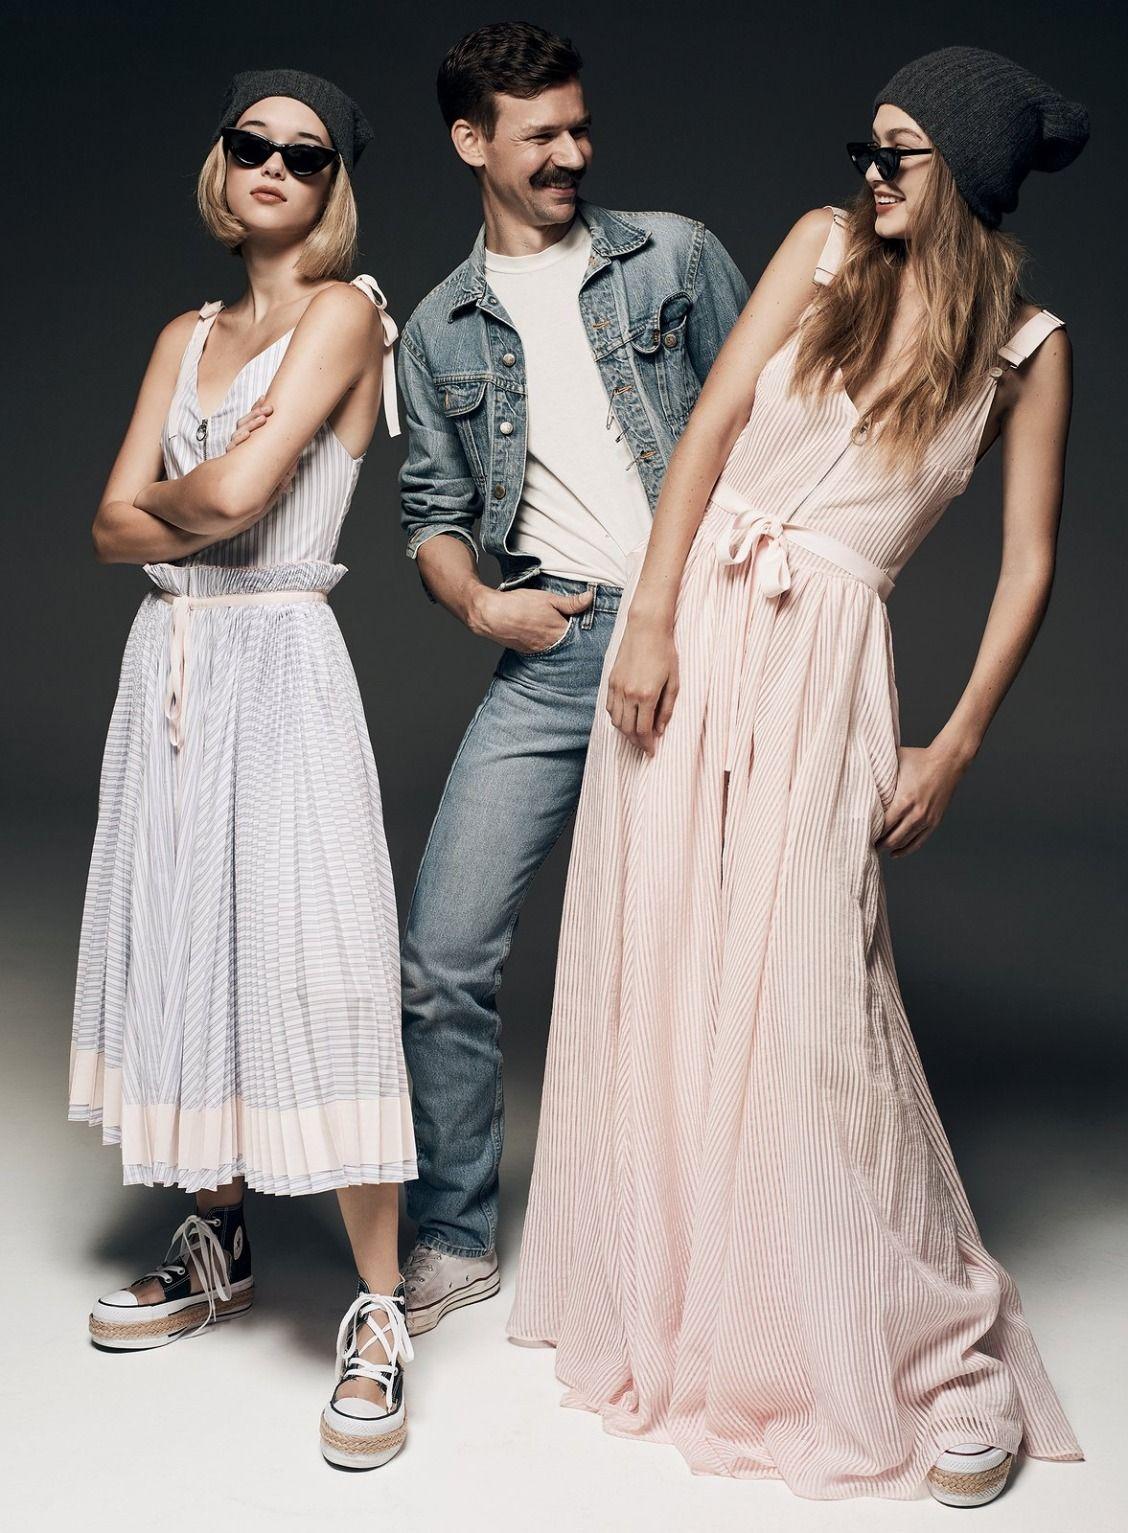 Gigi Hadid introduces the new class of CFDA/Vogue Fashion Fund designers: Adam Selman